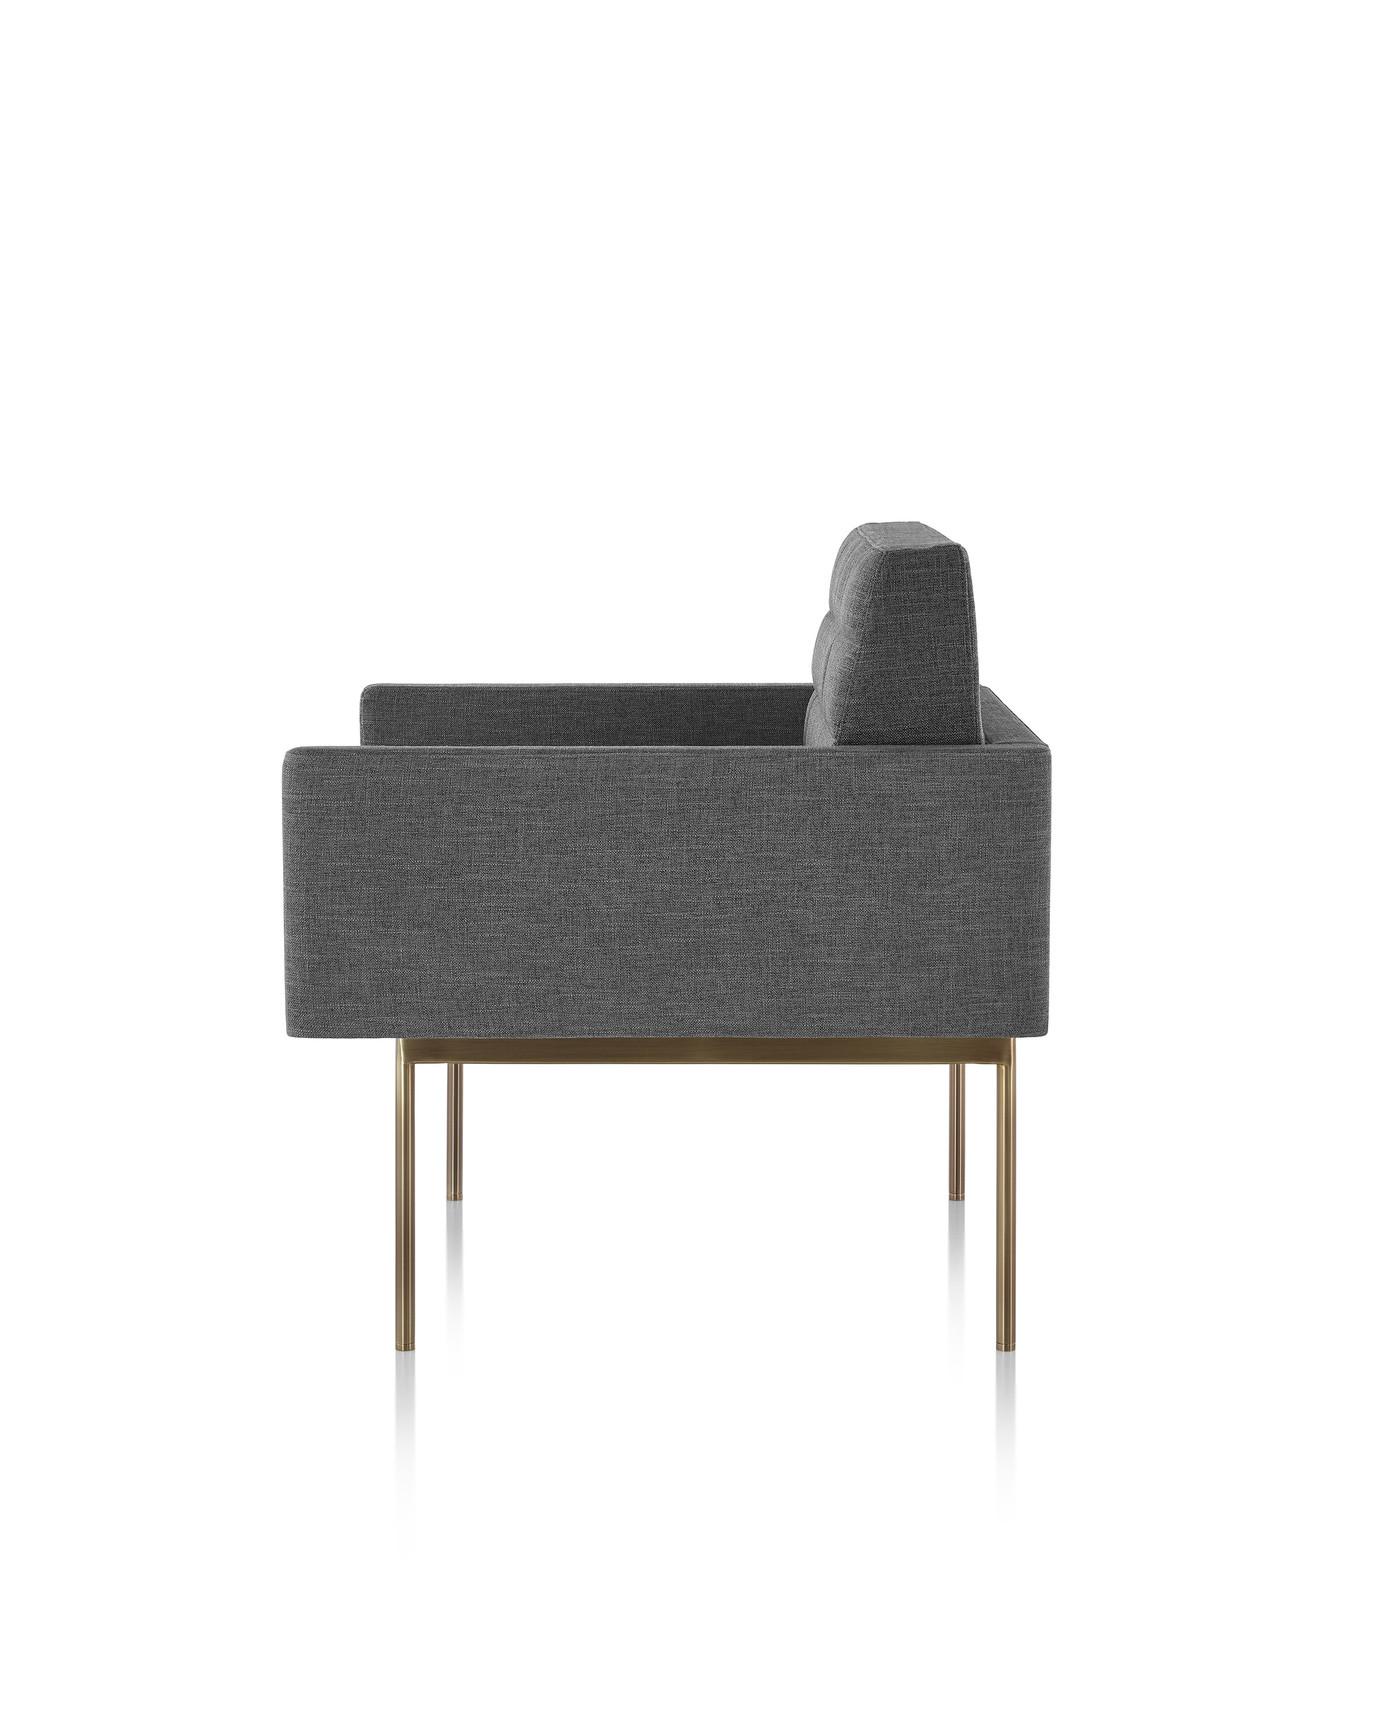 4-Silla-Lounge-Tuxedo-Lateral-1380